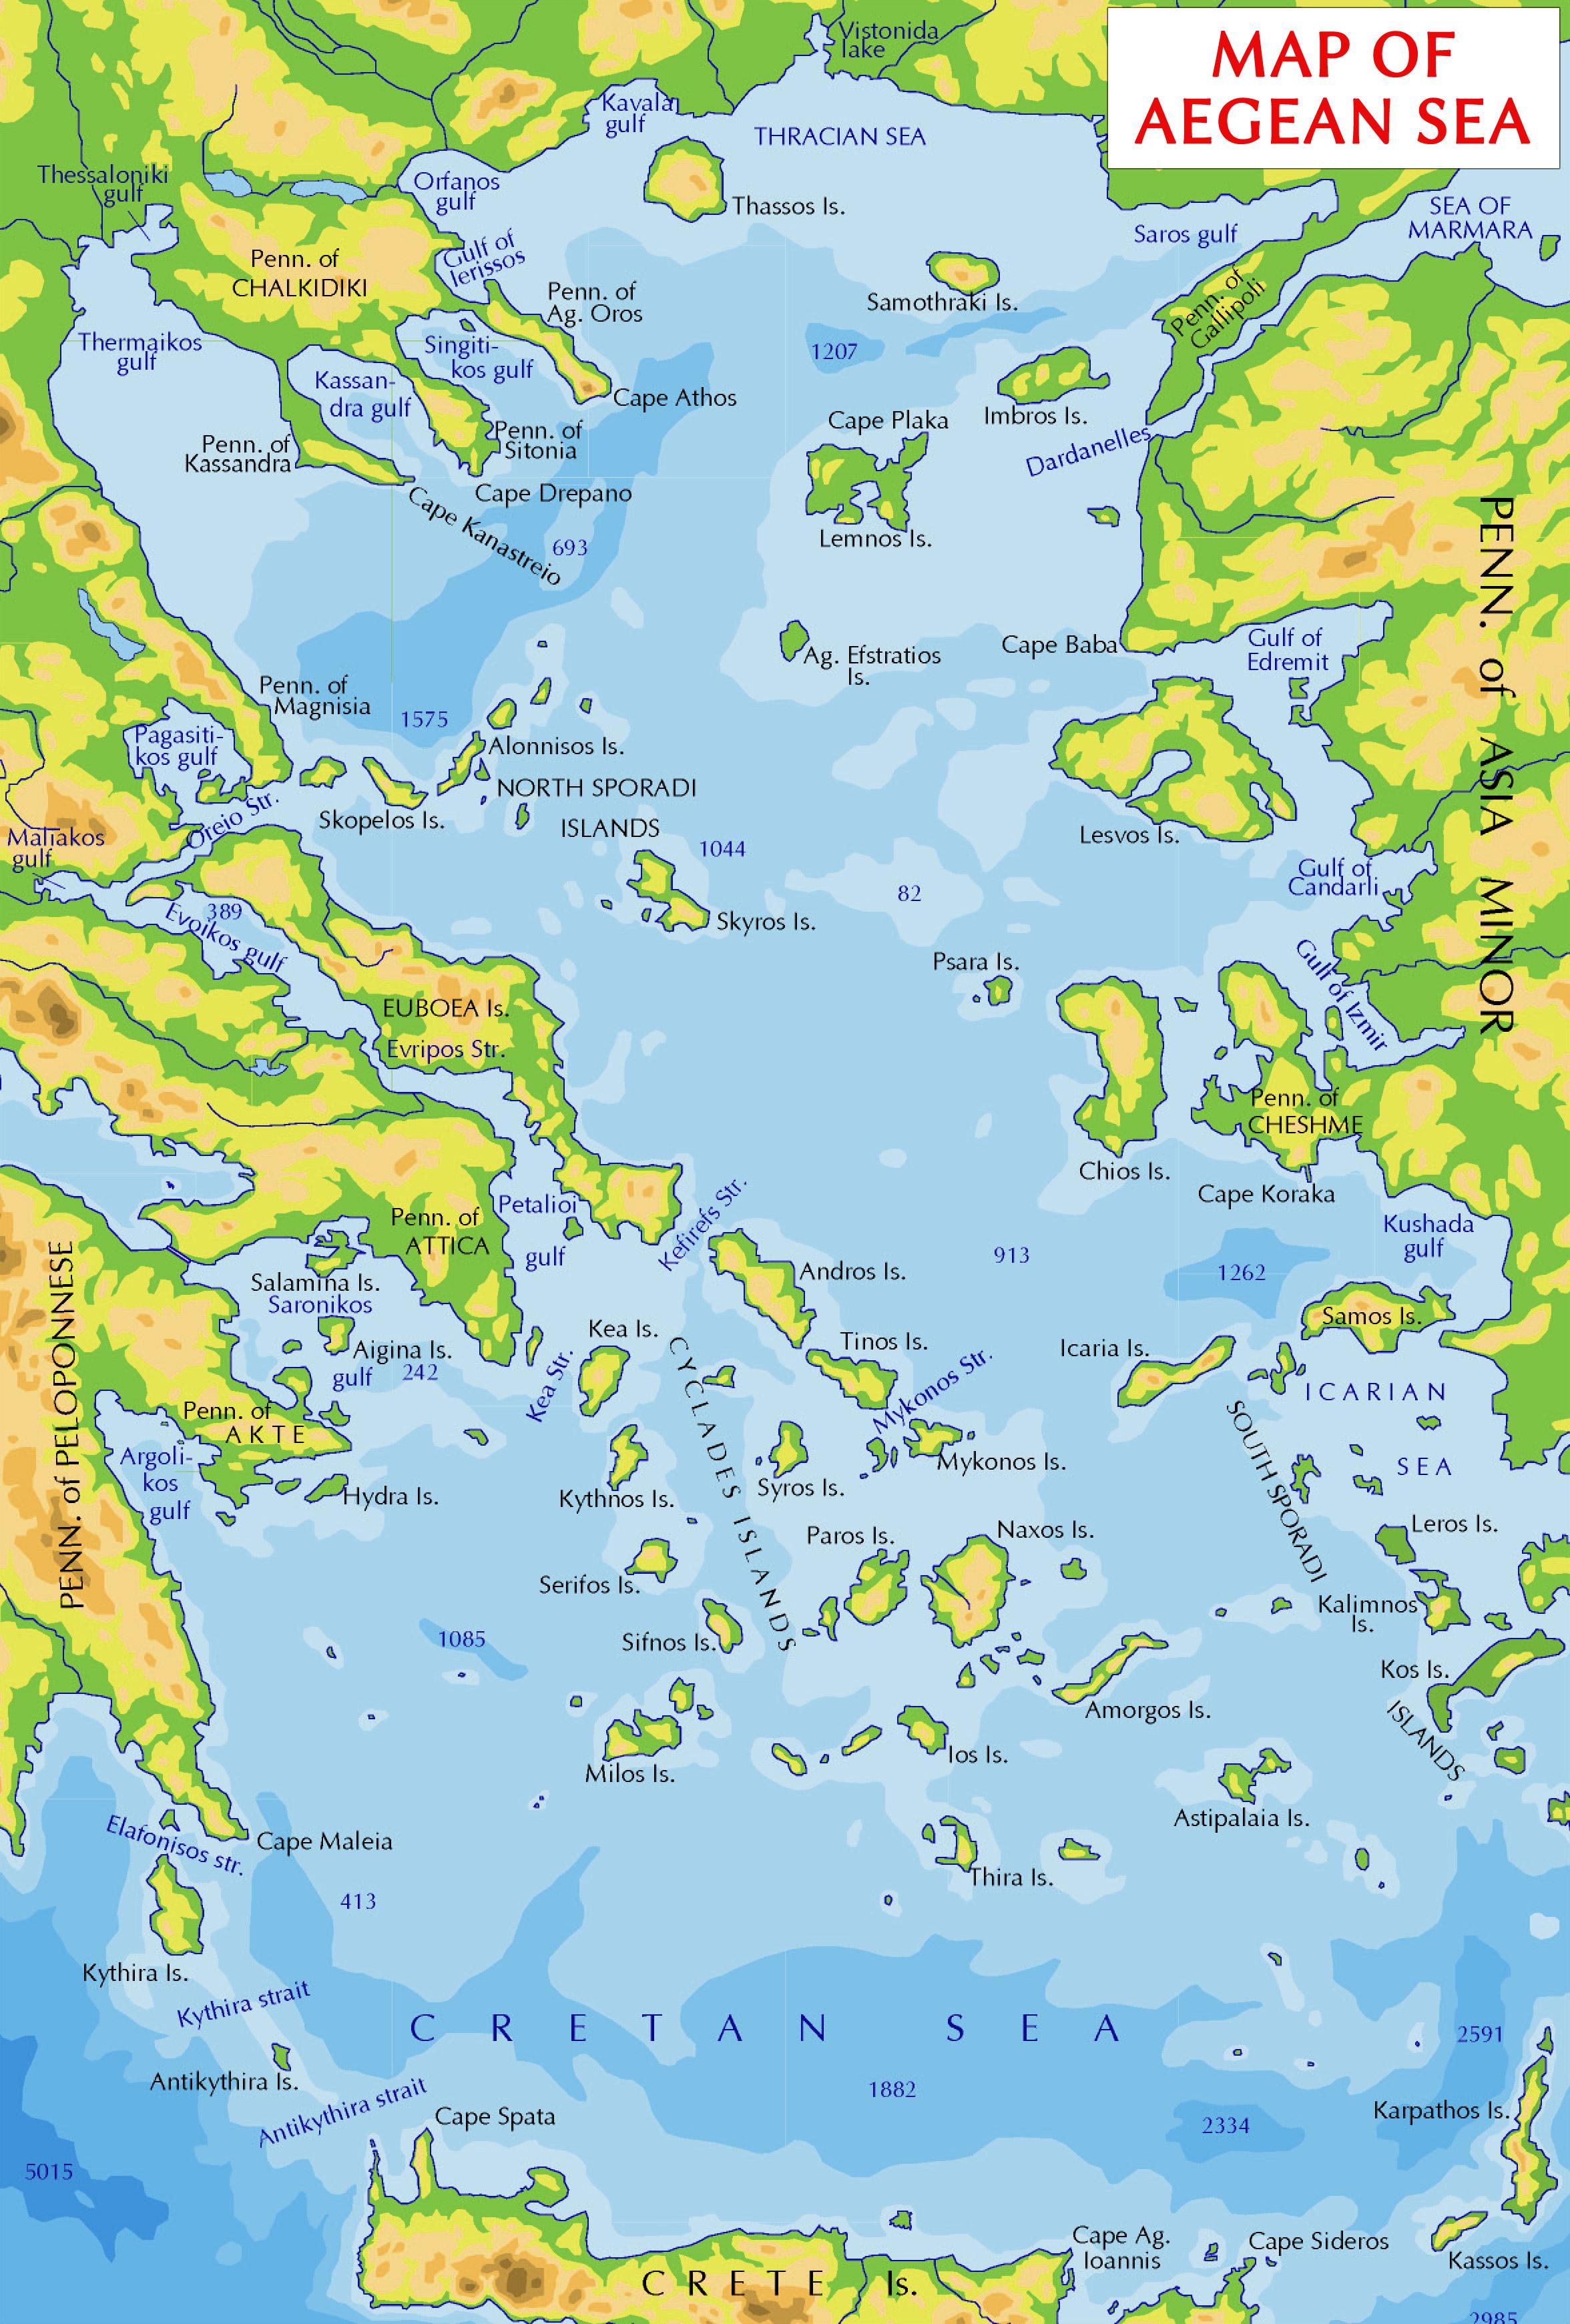 Aegean Sea On World Map : aegean, world, Icarian, Wikipedia